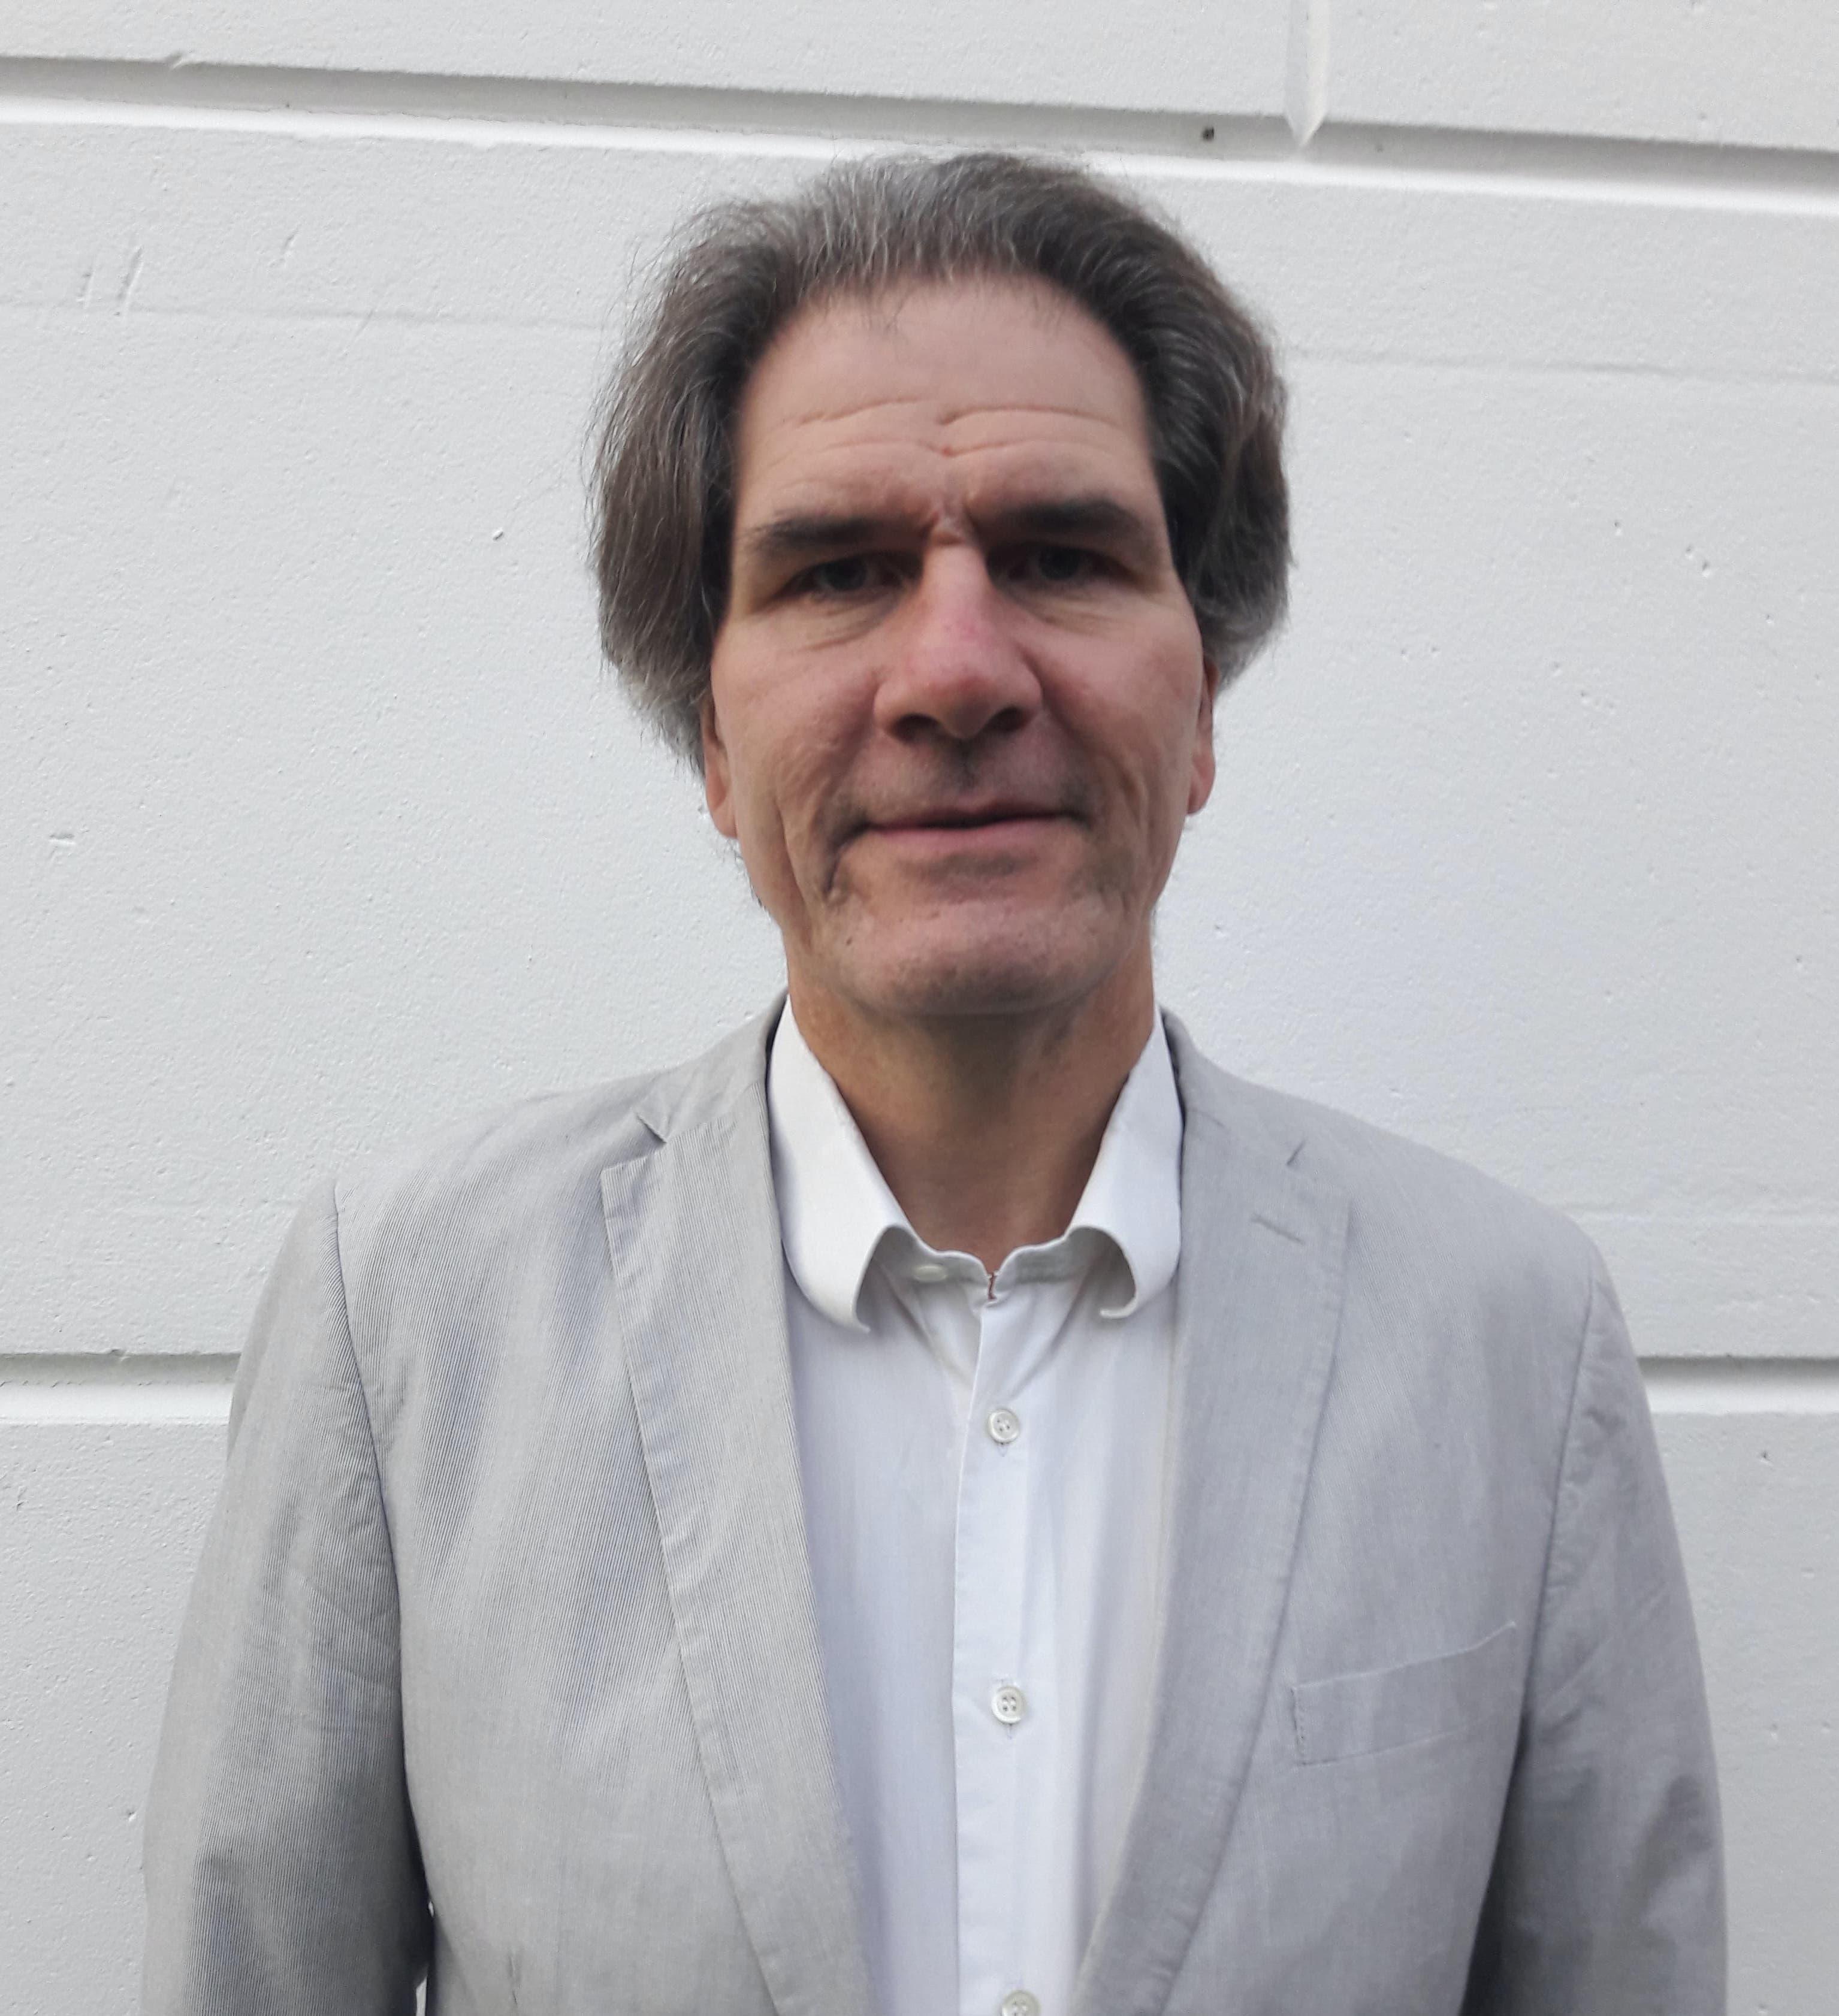 Menassetreff mit Harald Lipphart-Kirchmeir